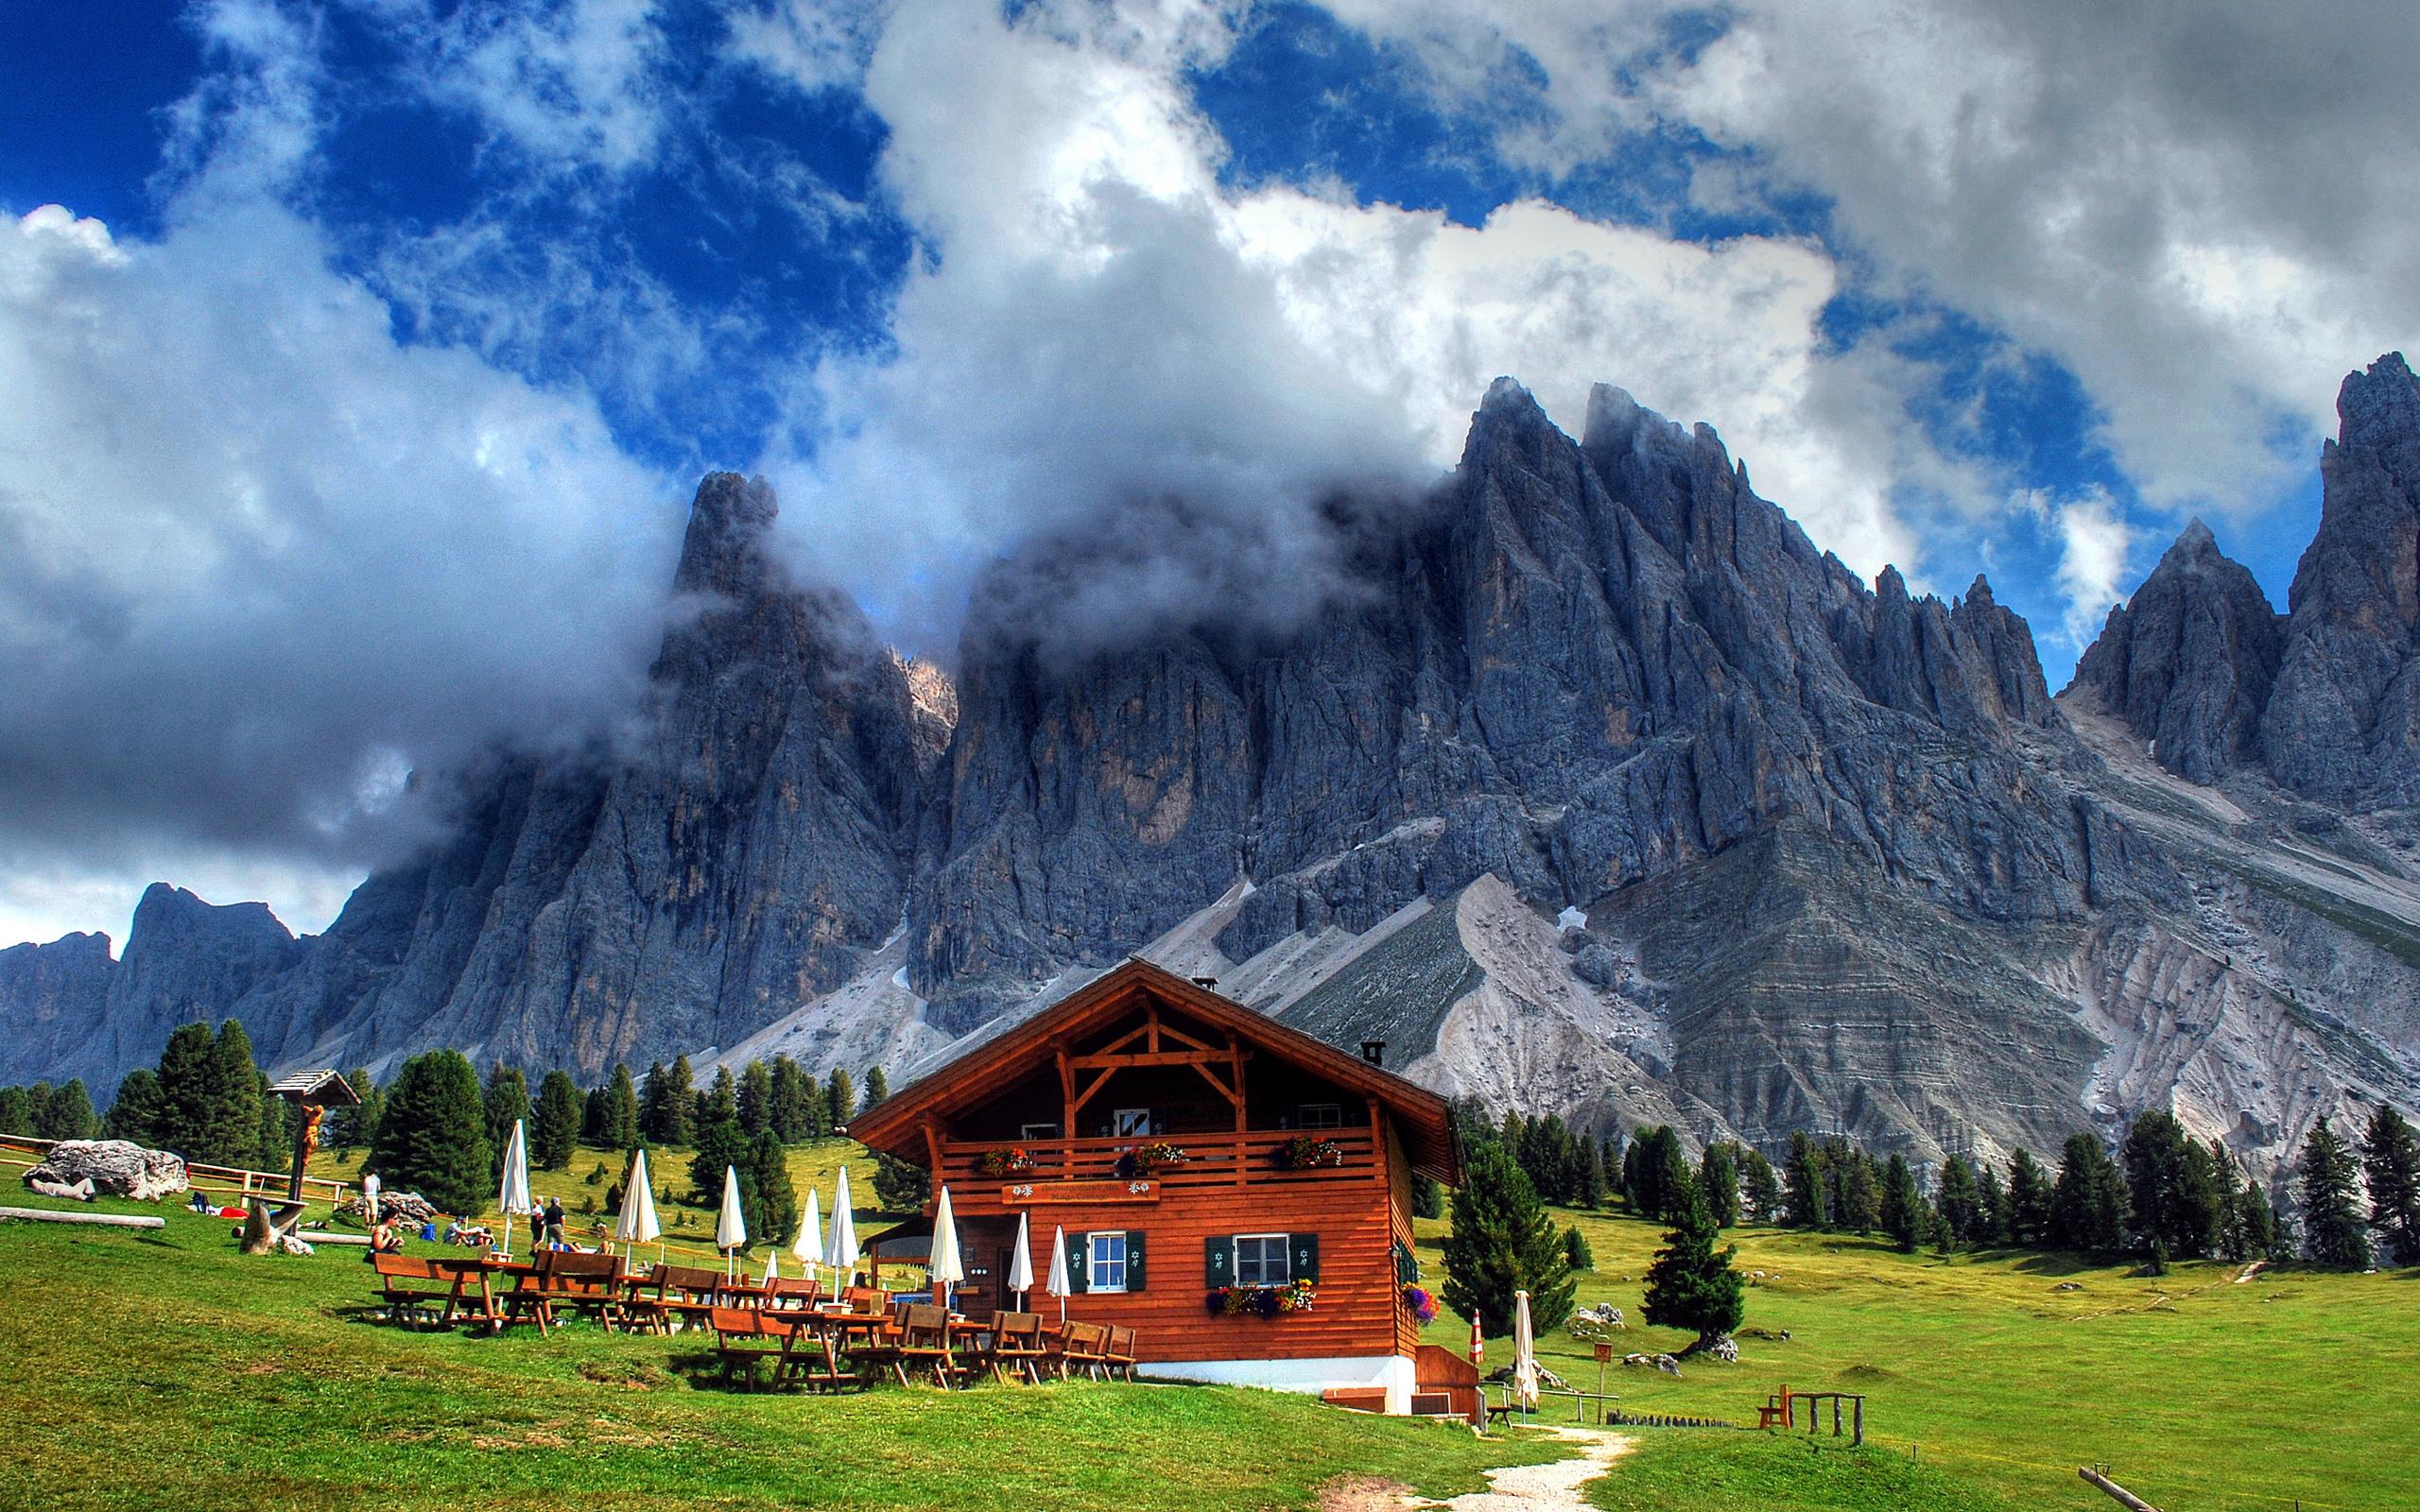 Хижинка в горах  № 1205637 без смс